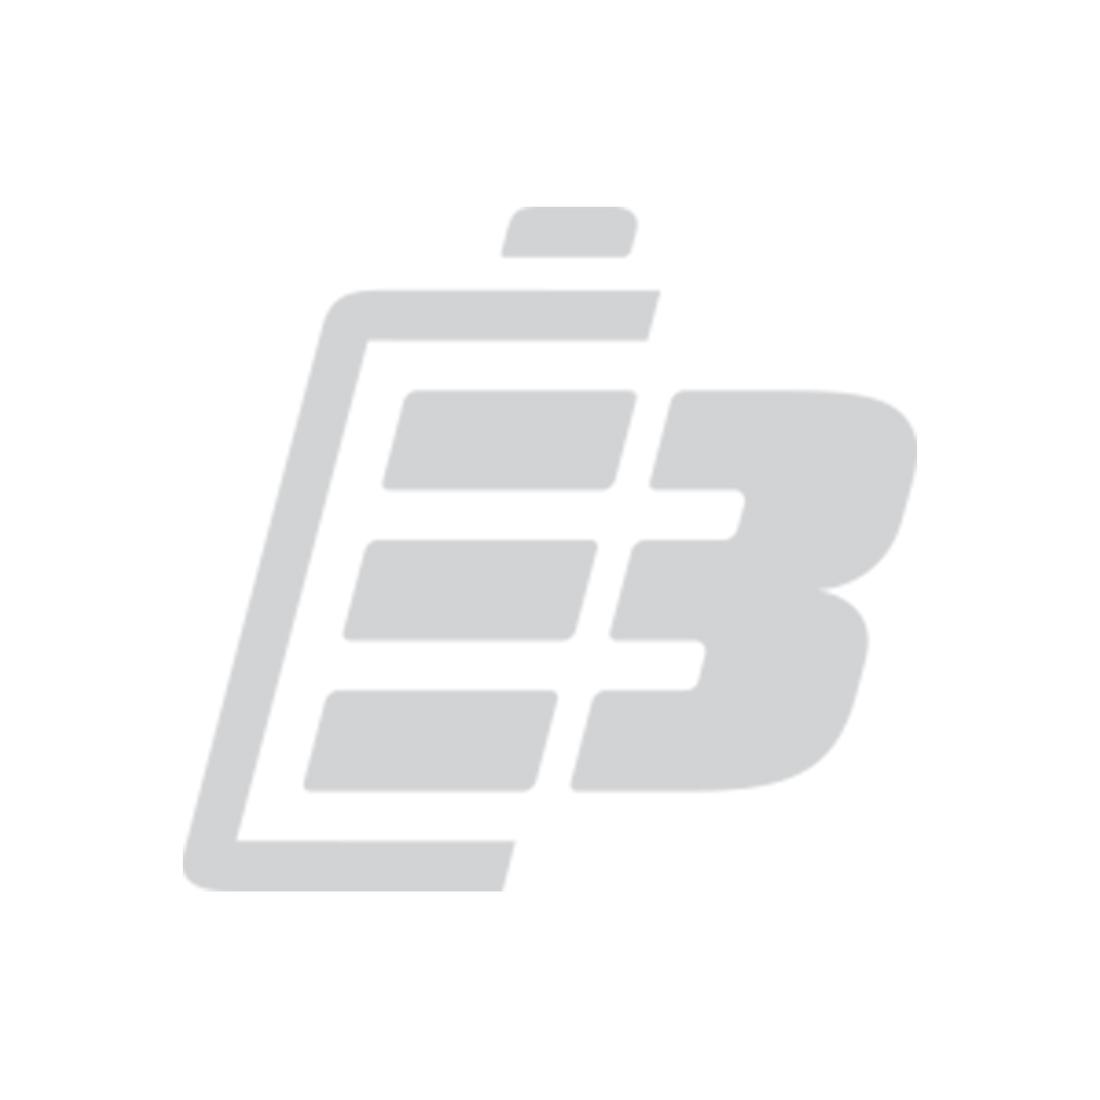 Cordless phone battery Siemens Gigaset SL930_1